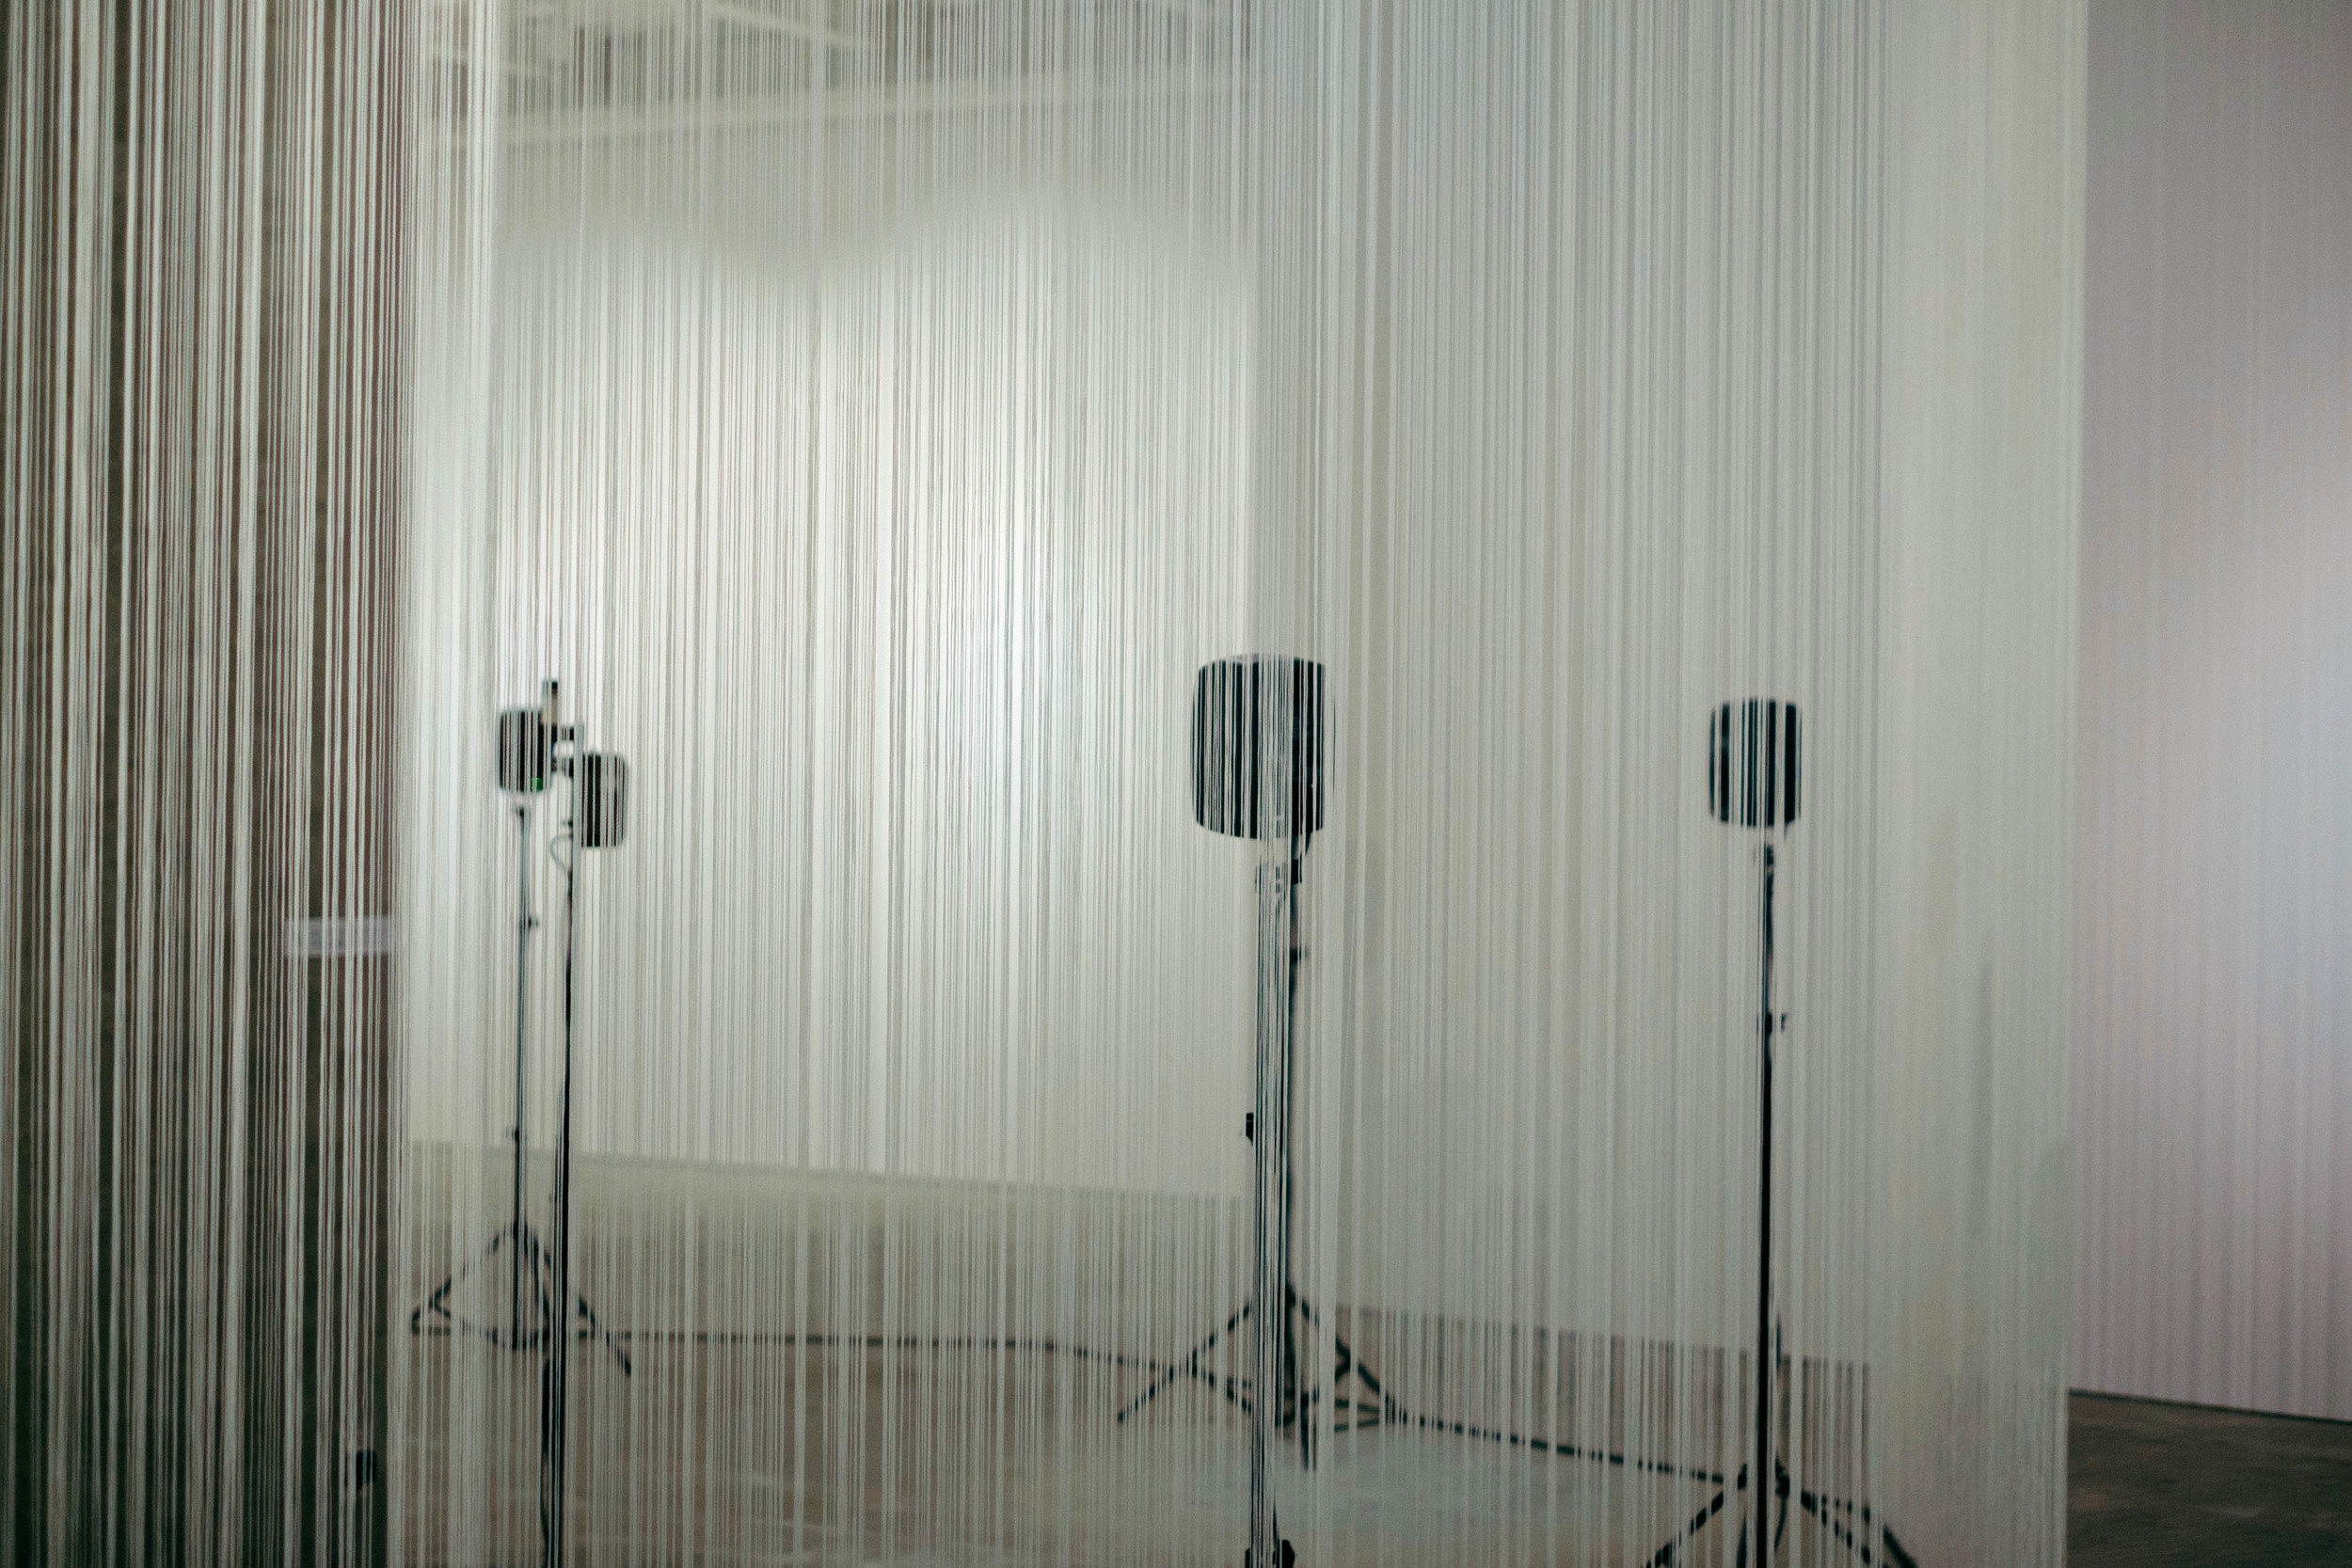 particle noise (ichihara version) - 2017 /Carsten Nicolai